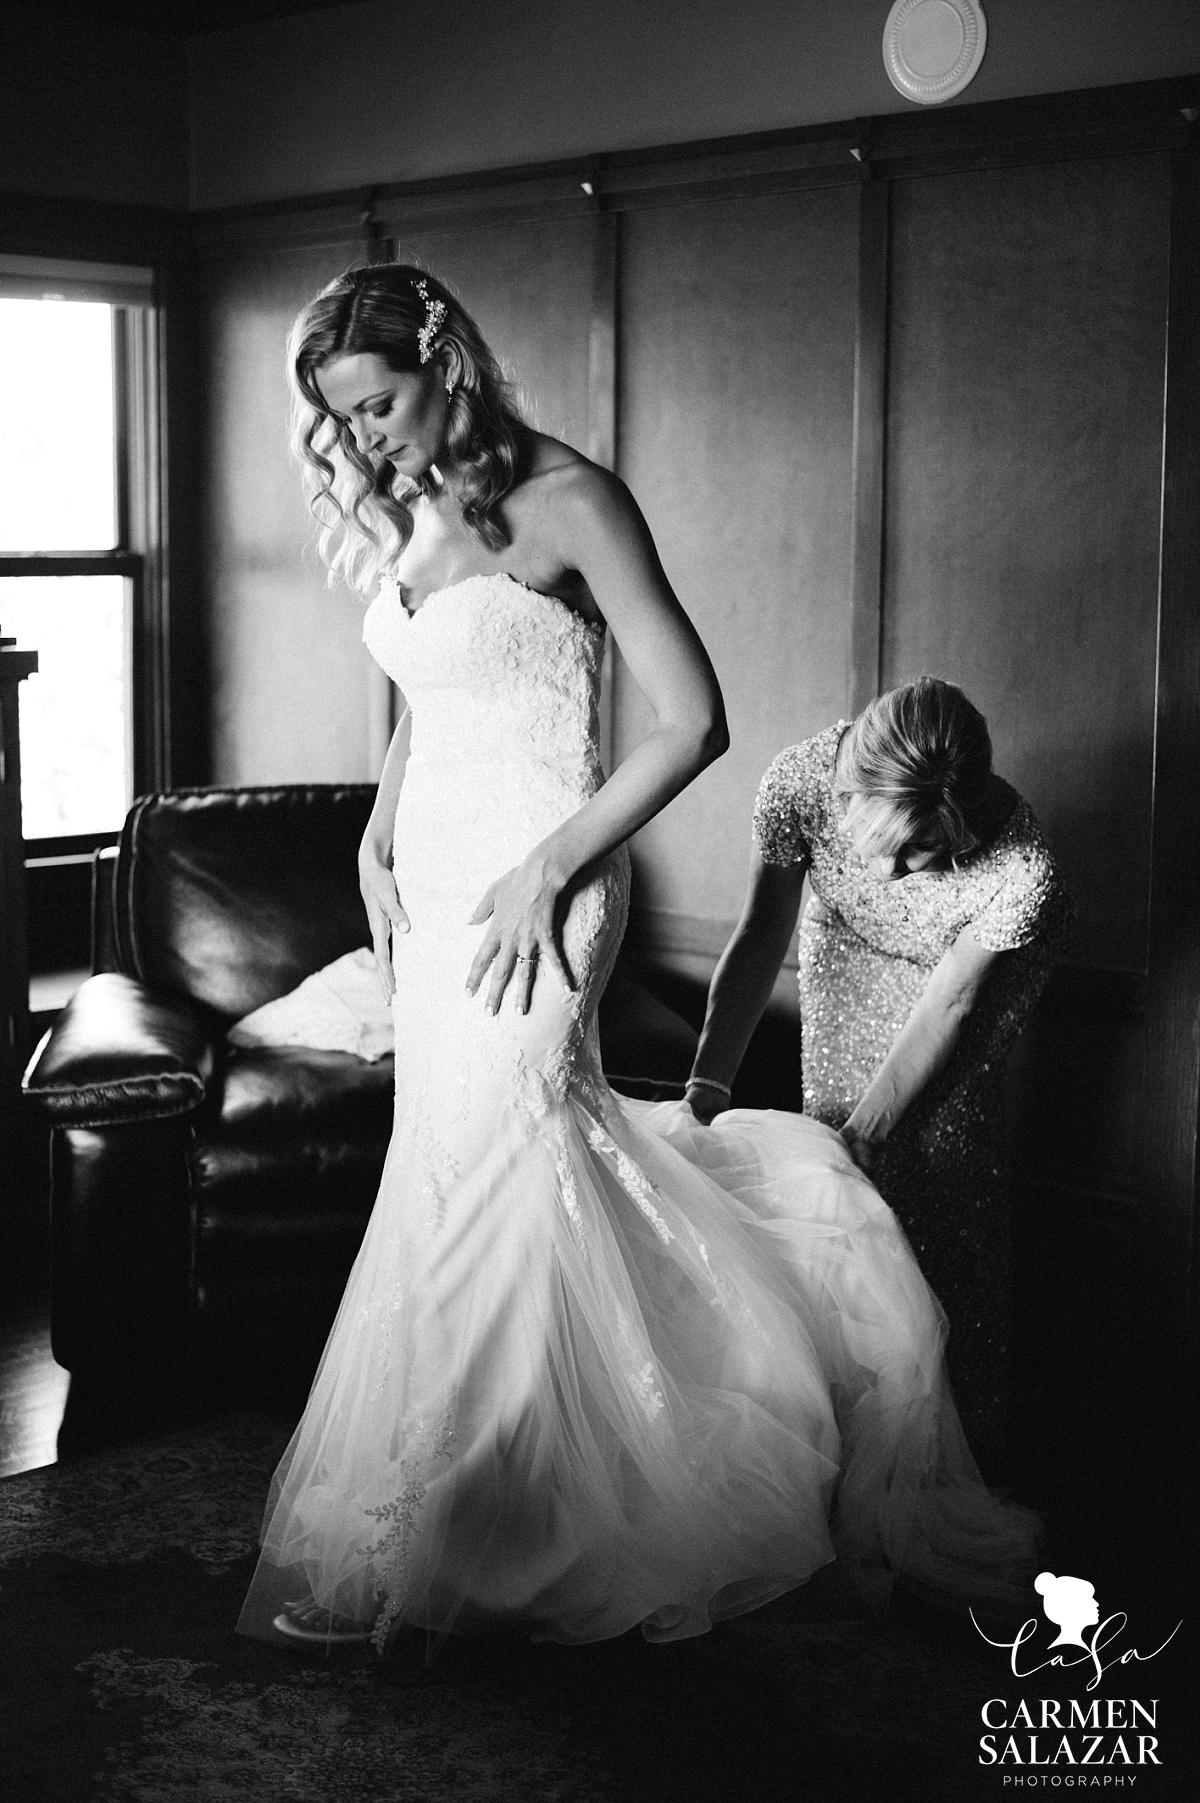 Stunning vintage beauty bride in lace wedding gown - Carmen Salazar